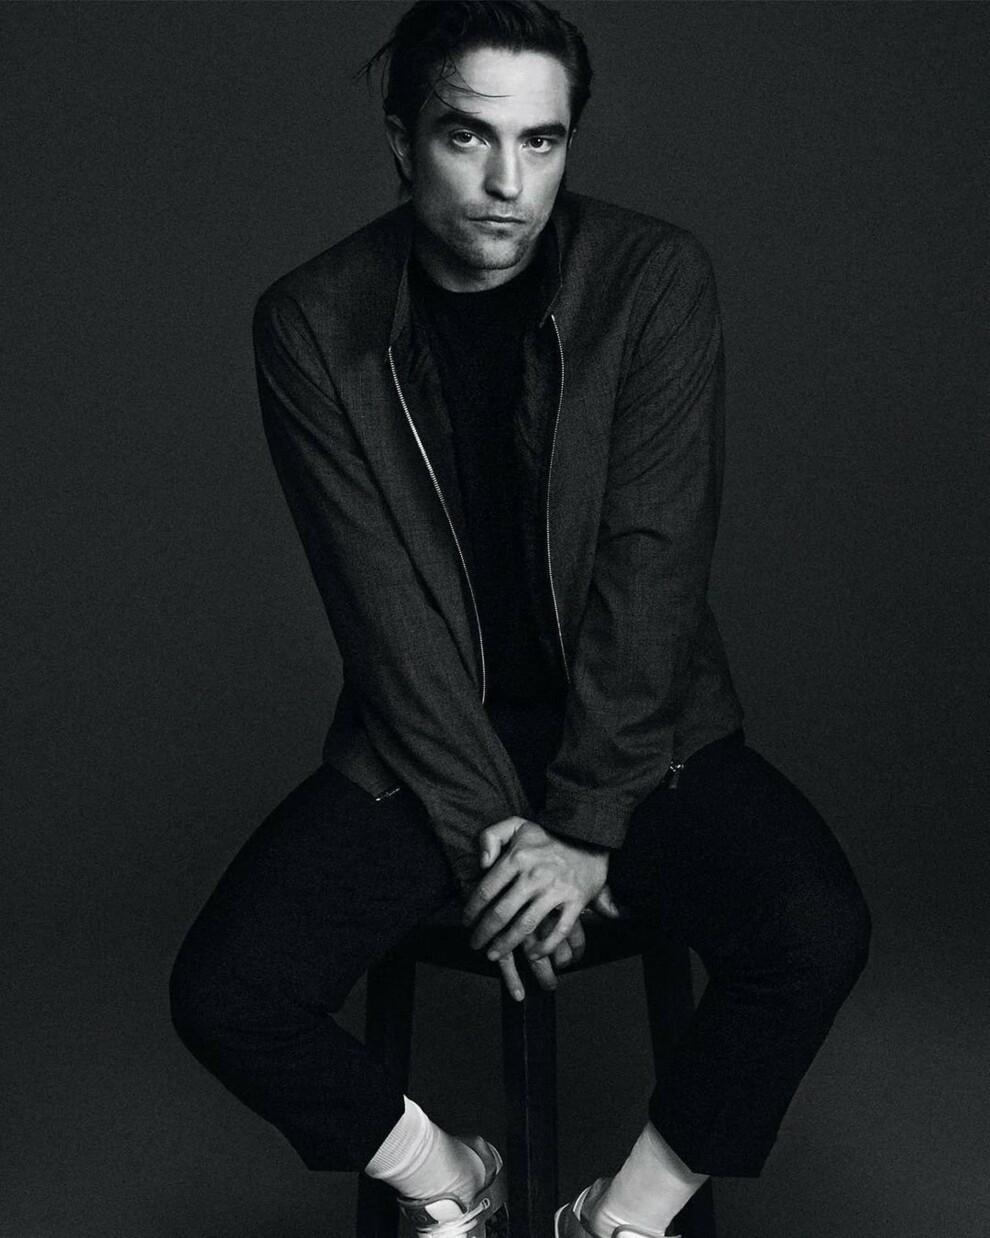 Любуемся: Роберт Паттинсон снялся в рекламной кампании Dior Homme (ФОТО) - фото №2